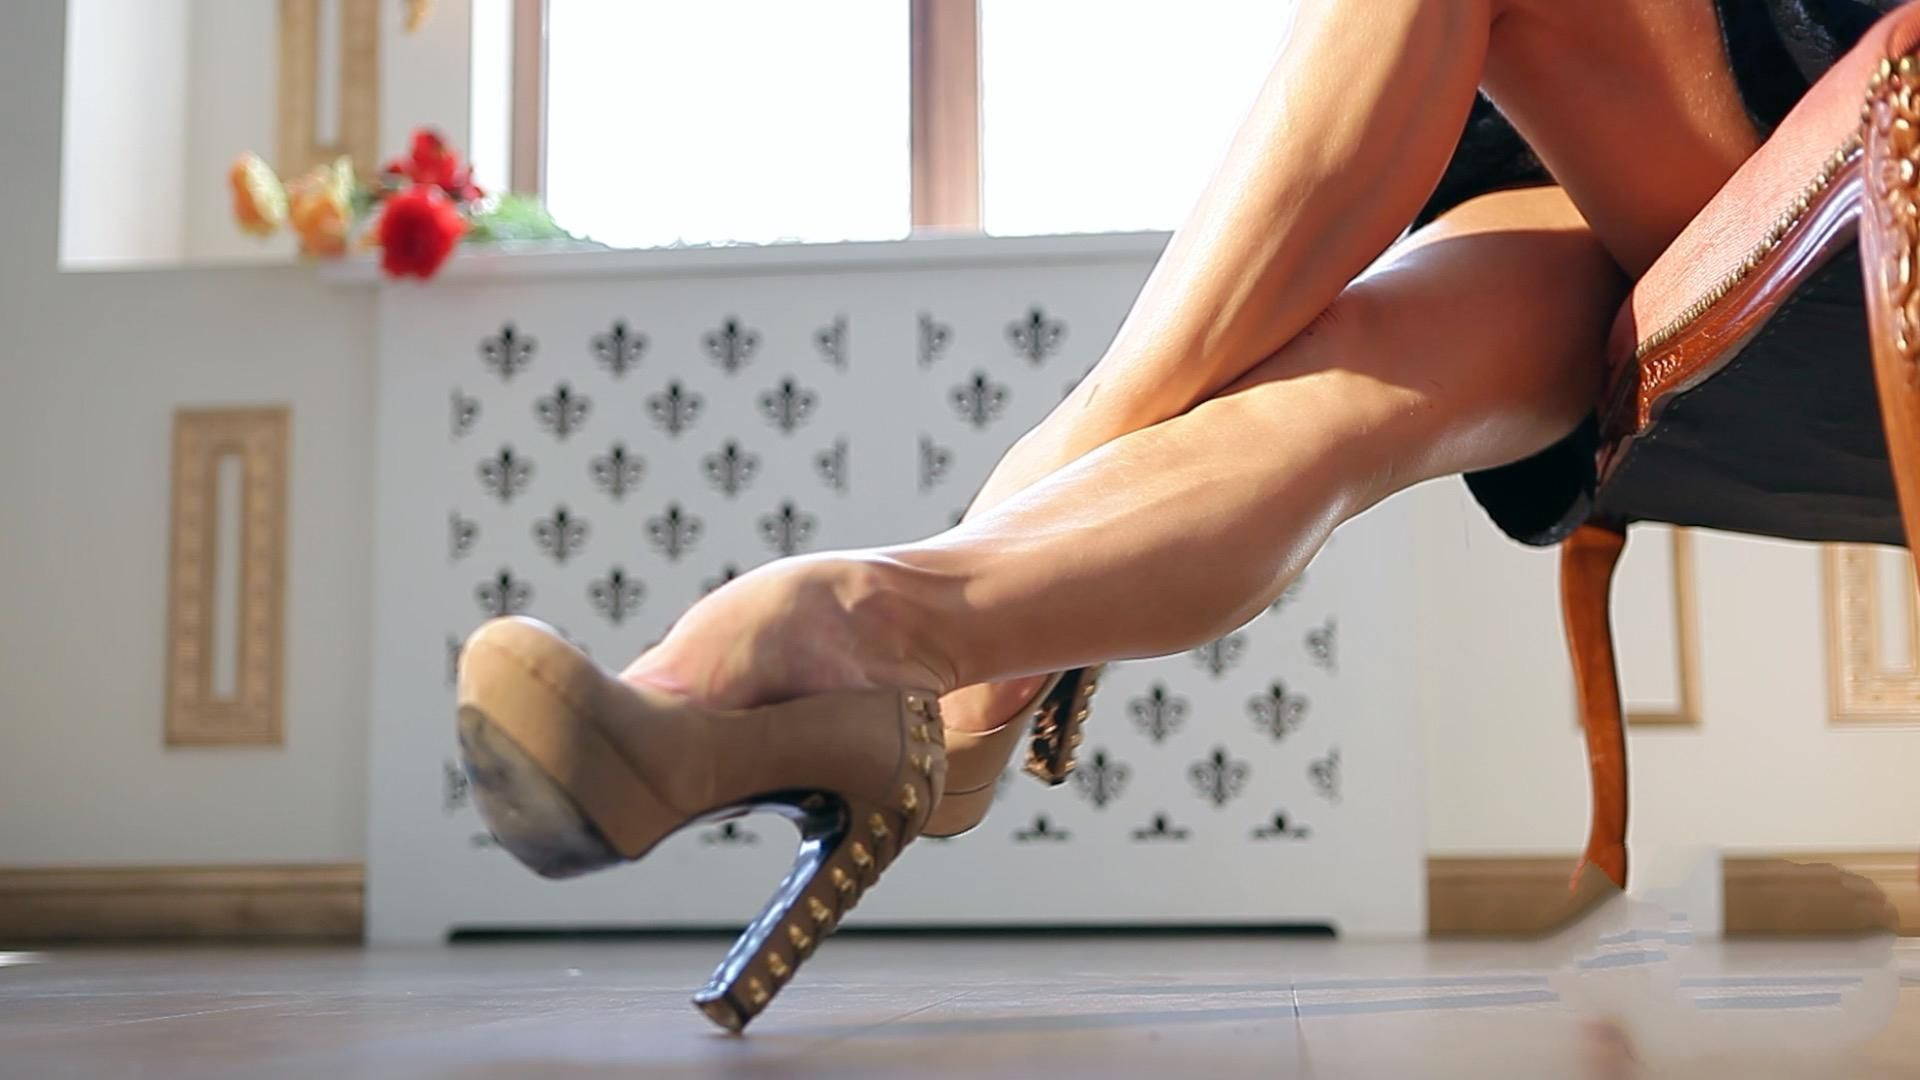 #woman #sexy #legs #high #heels #beautiful #kiss #feet